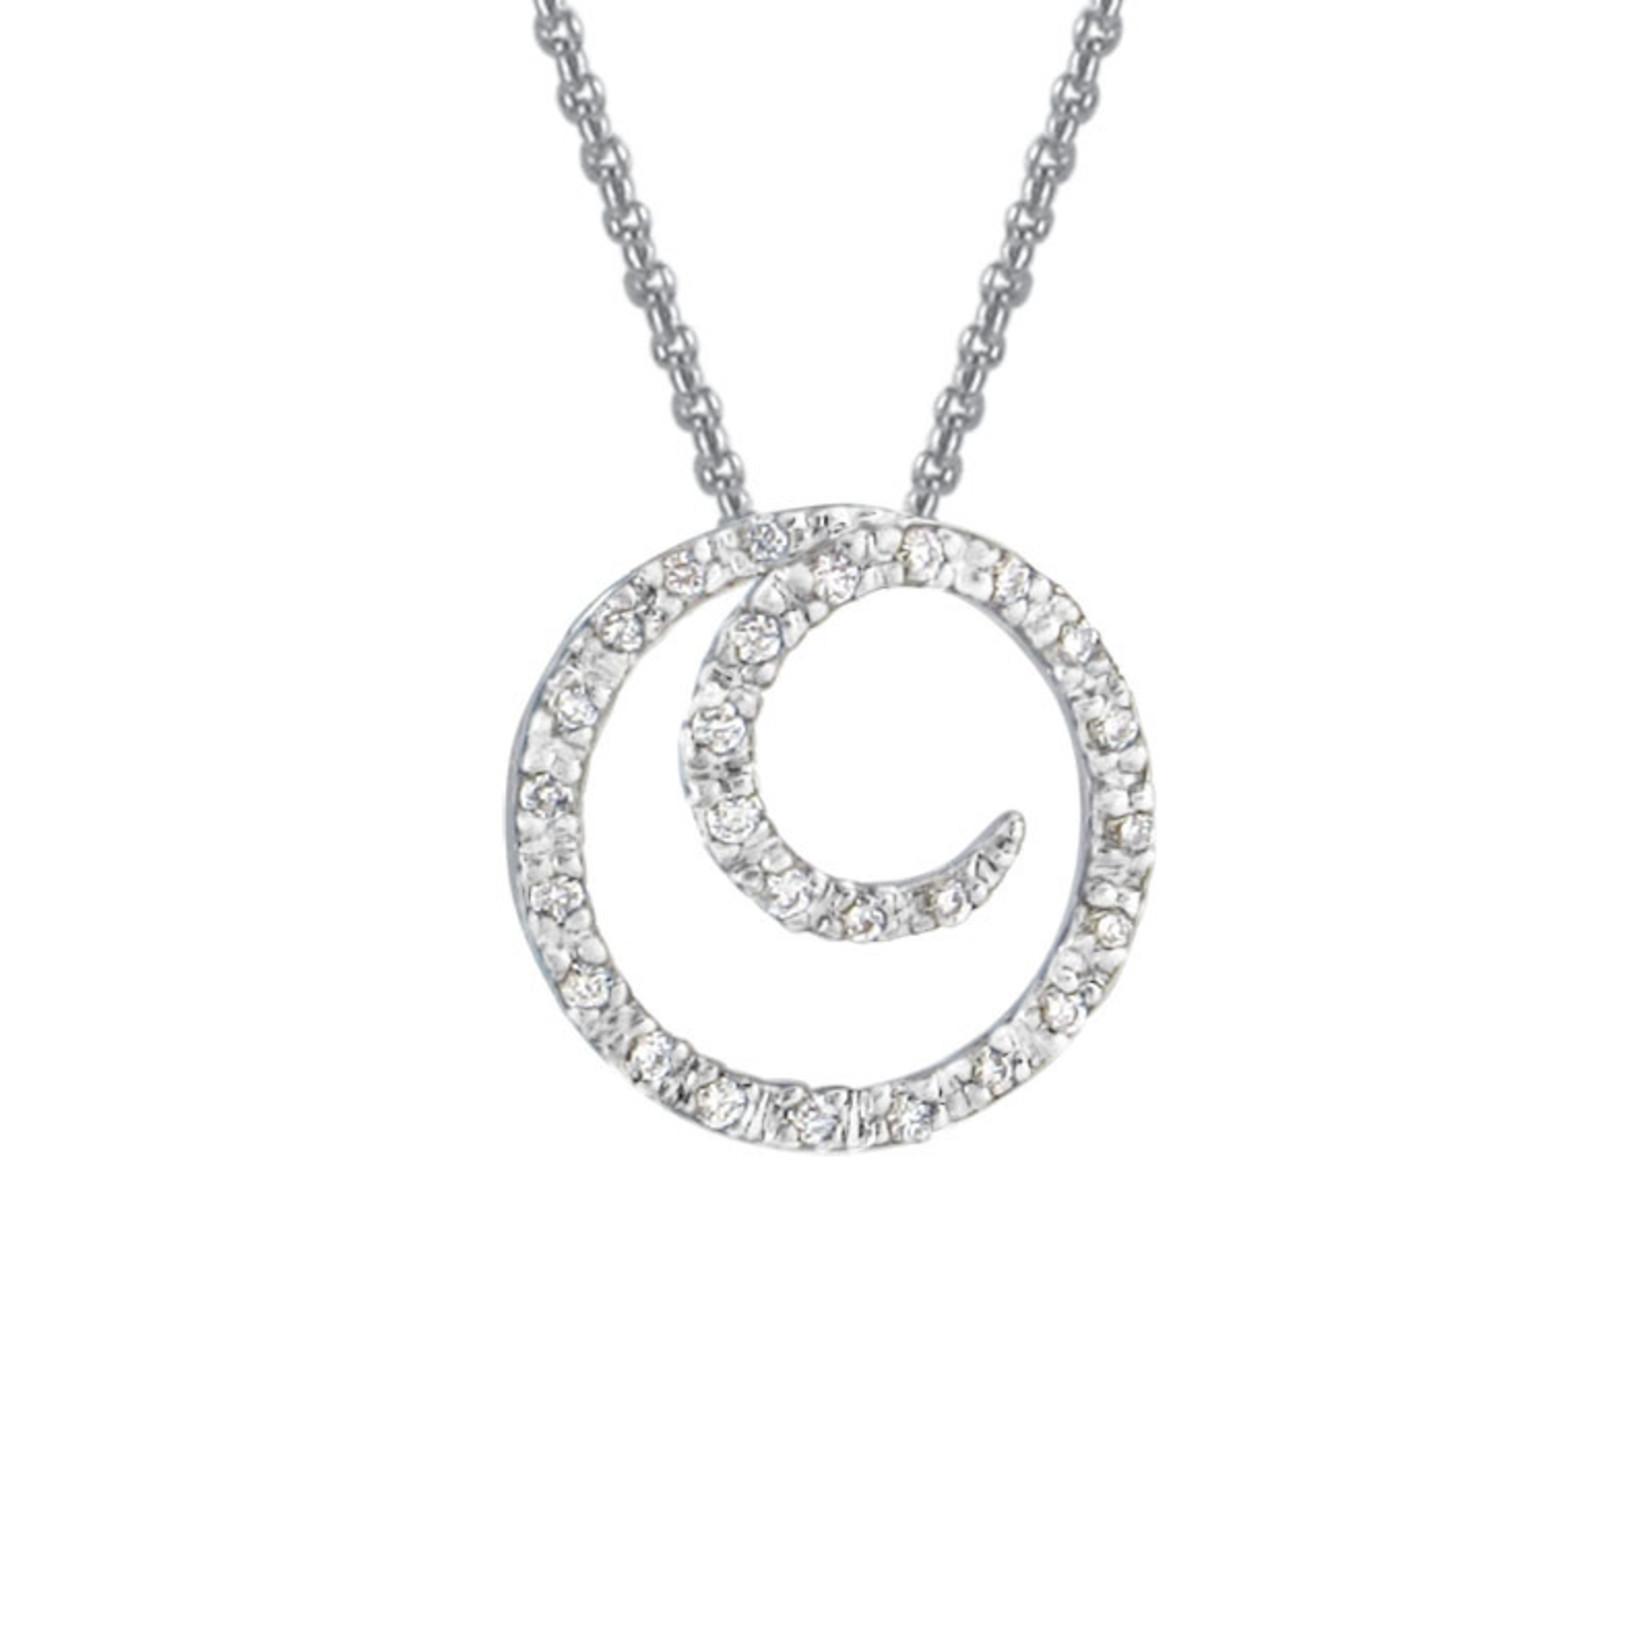 Petite Swirl Diamond Pendant